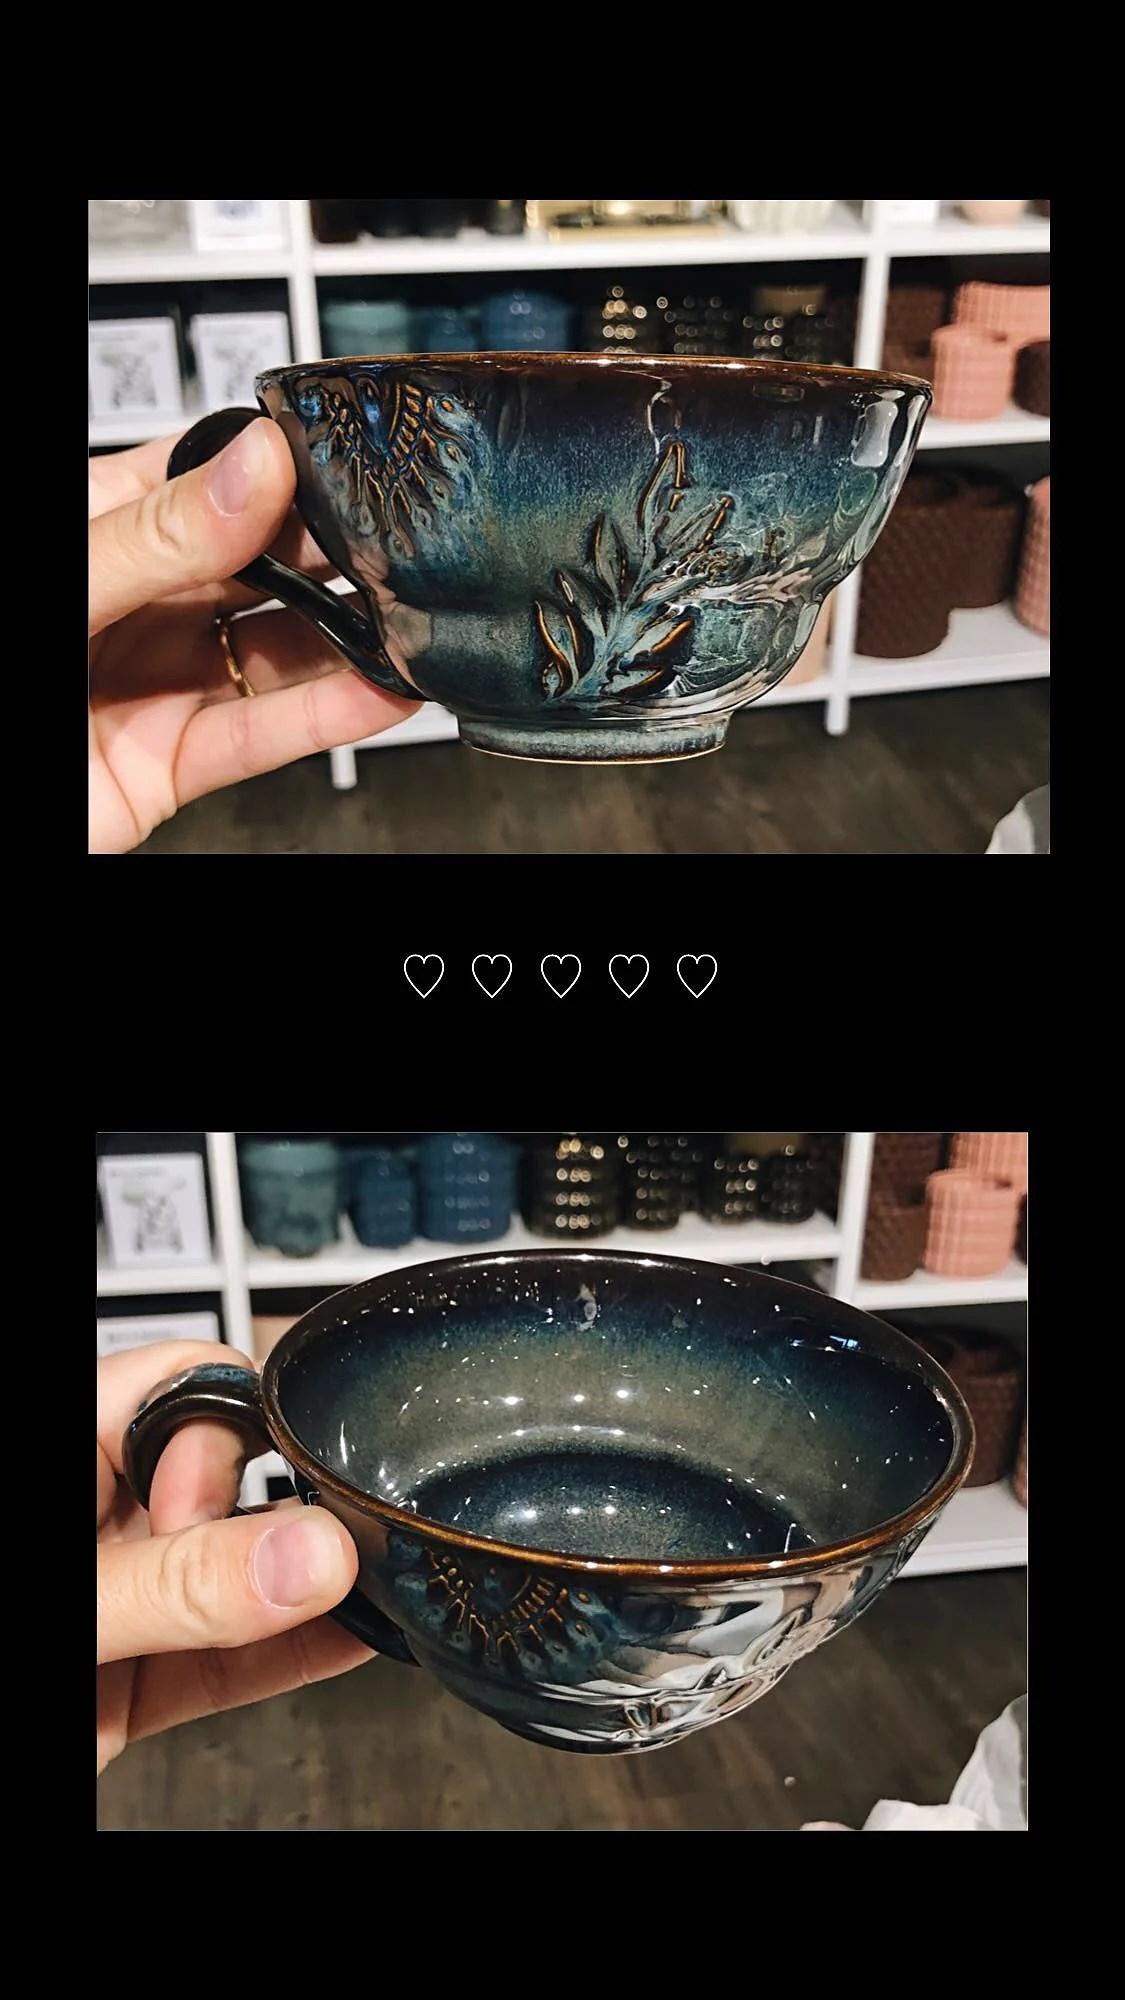 Den finaste koppen jag sett!